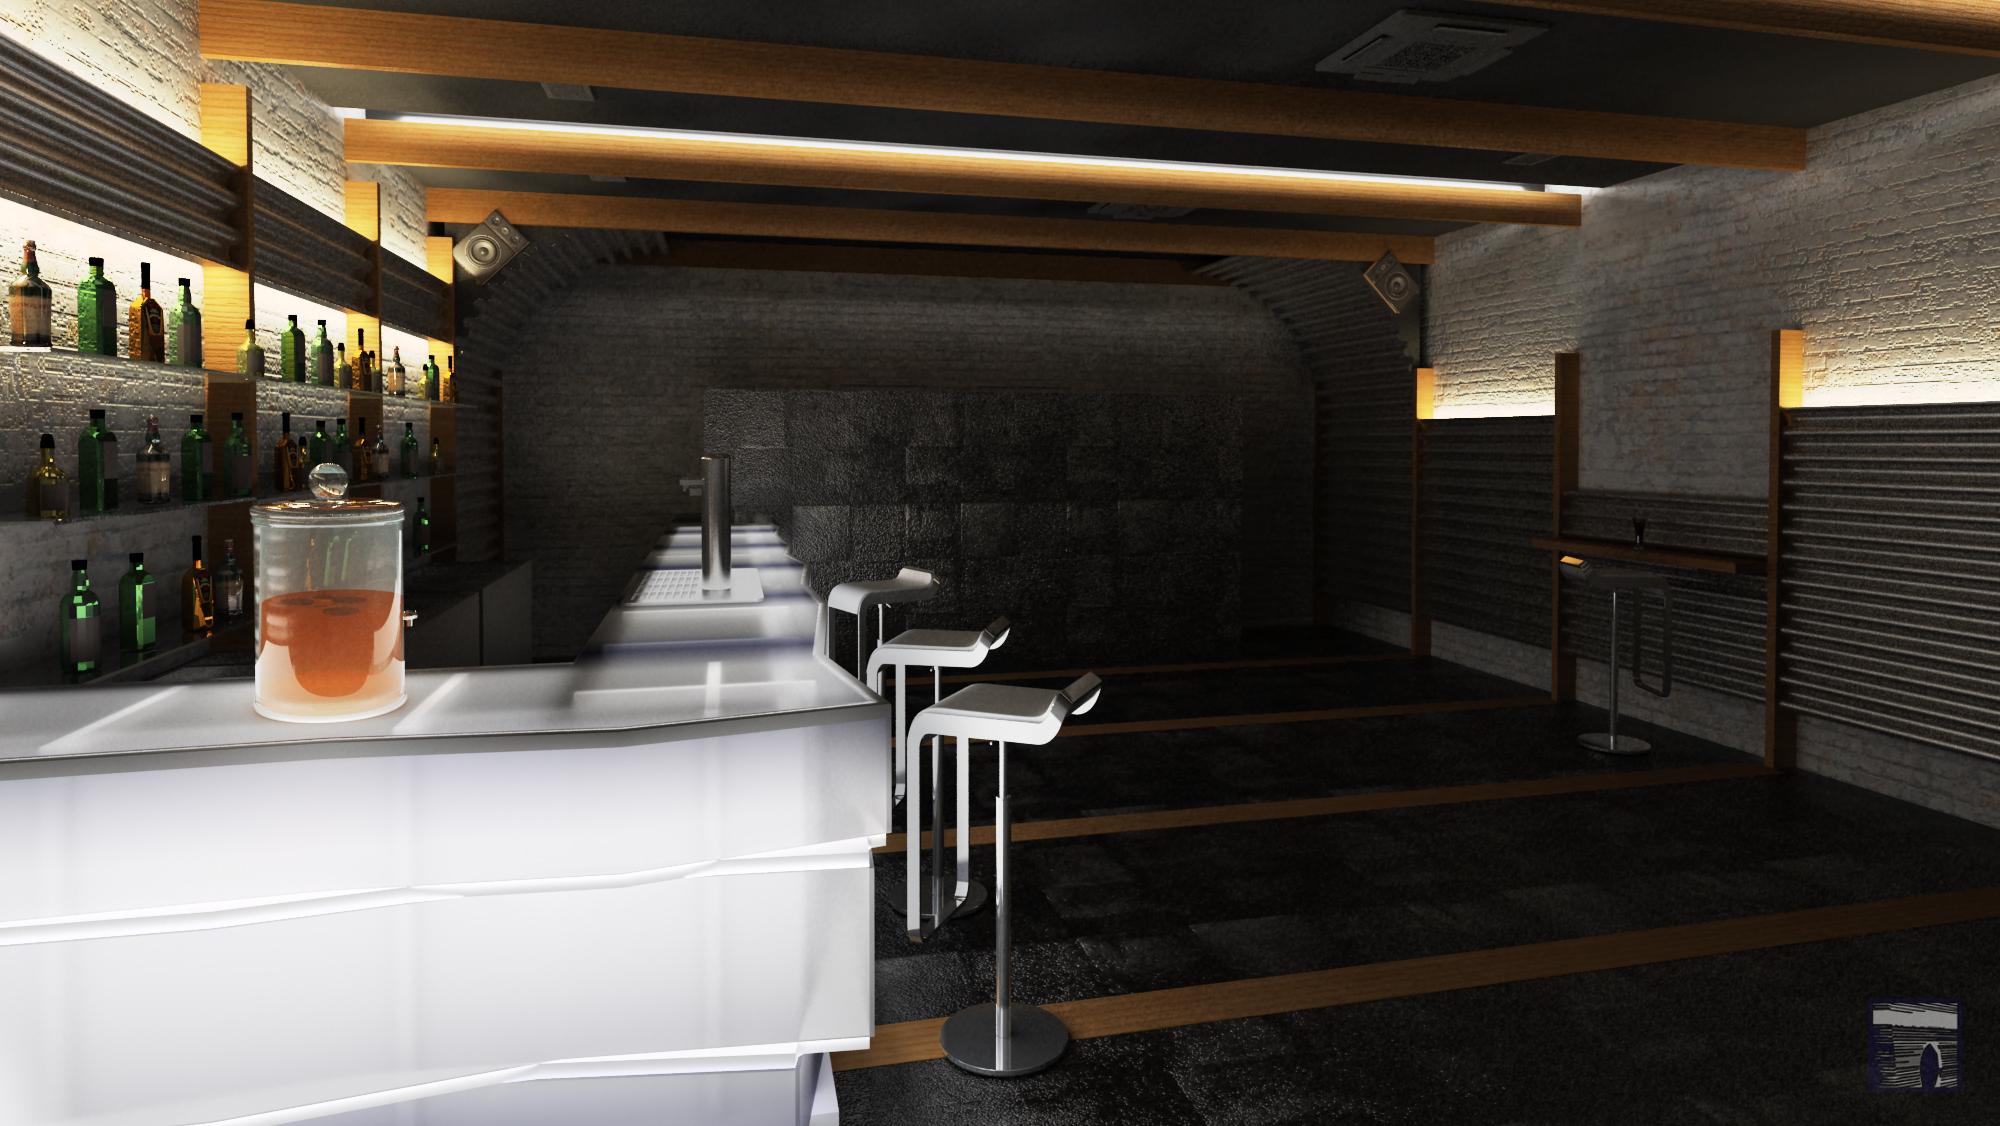 Xaloc arquitectos estudio de arquitectura en getafe - Estudios de arquitectura en madrid ...